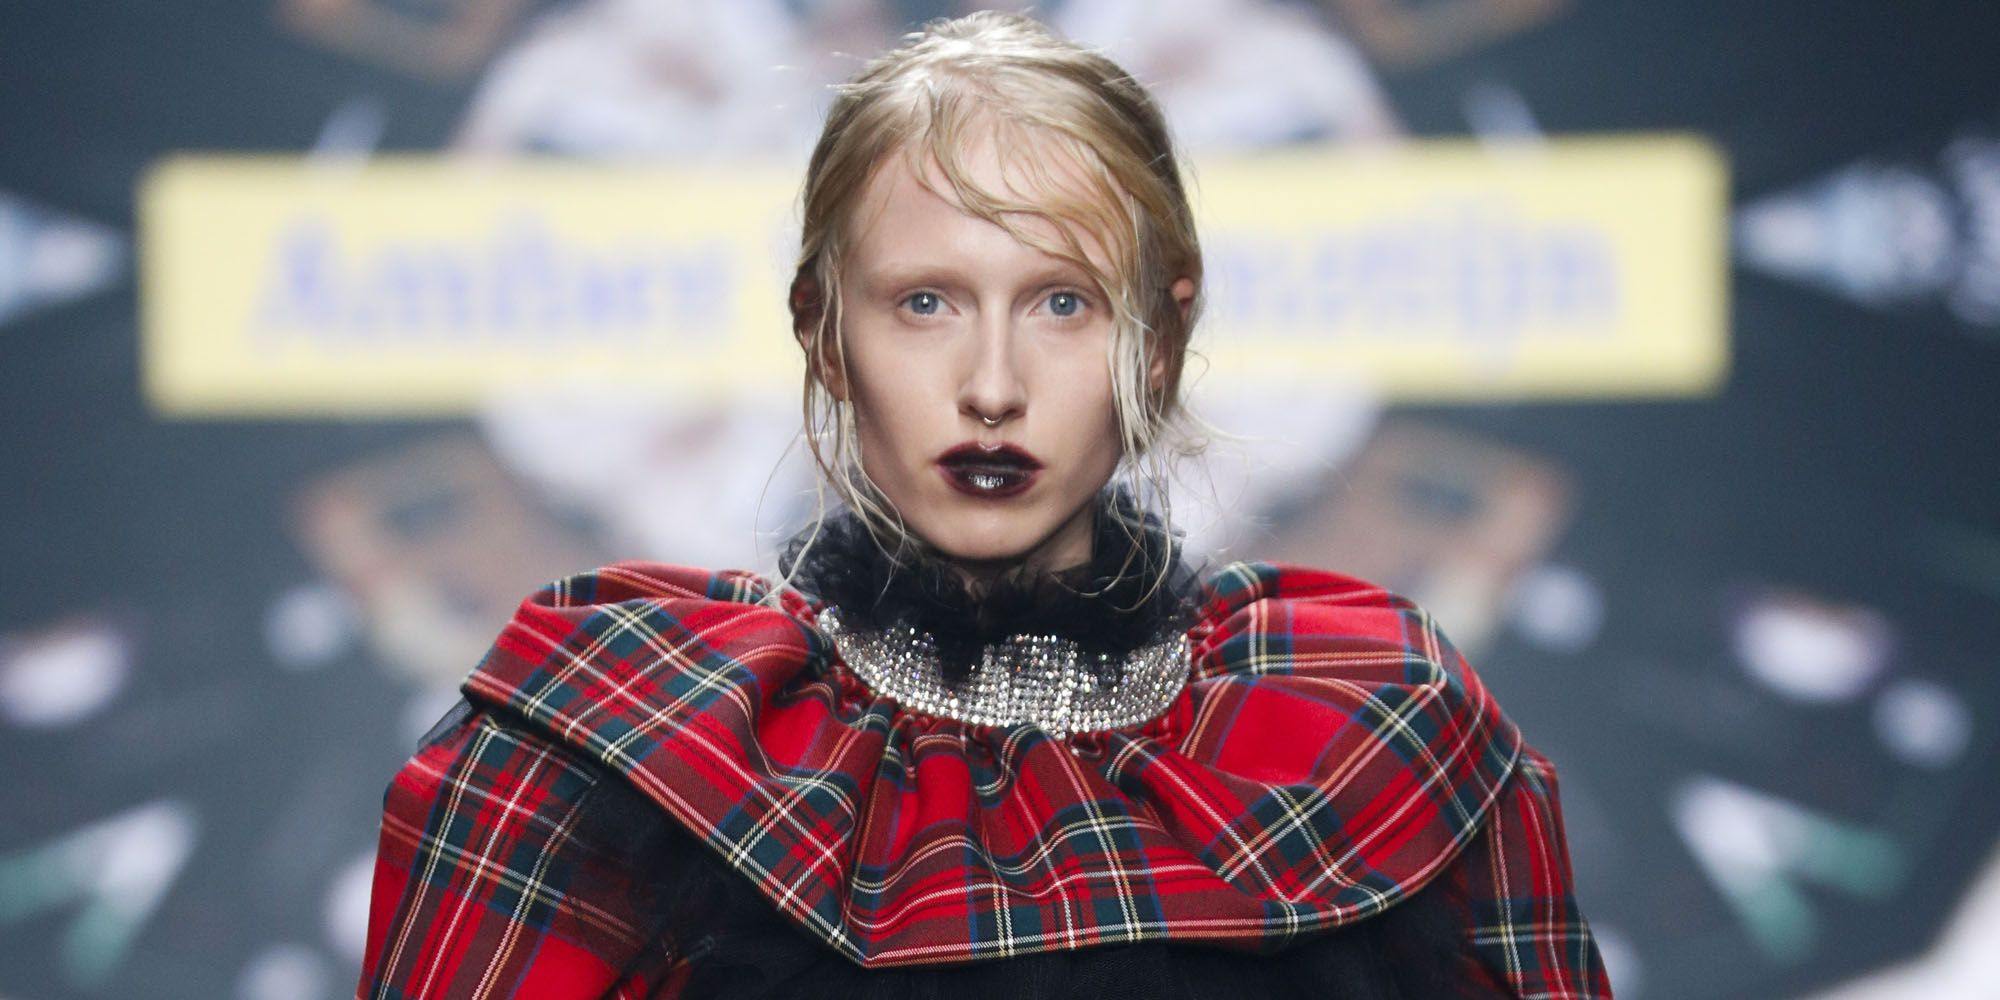 Amber Willemztijn Lidl designer contest